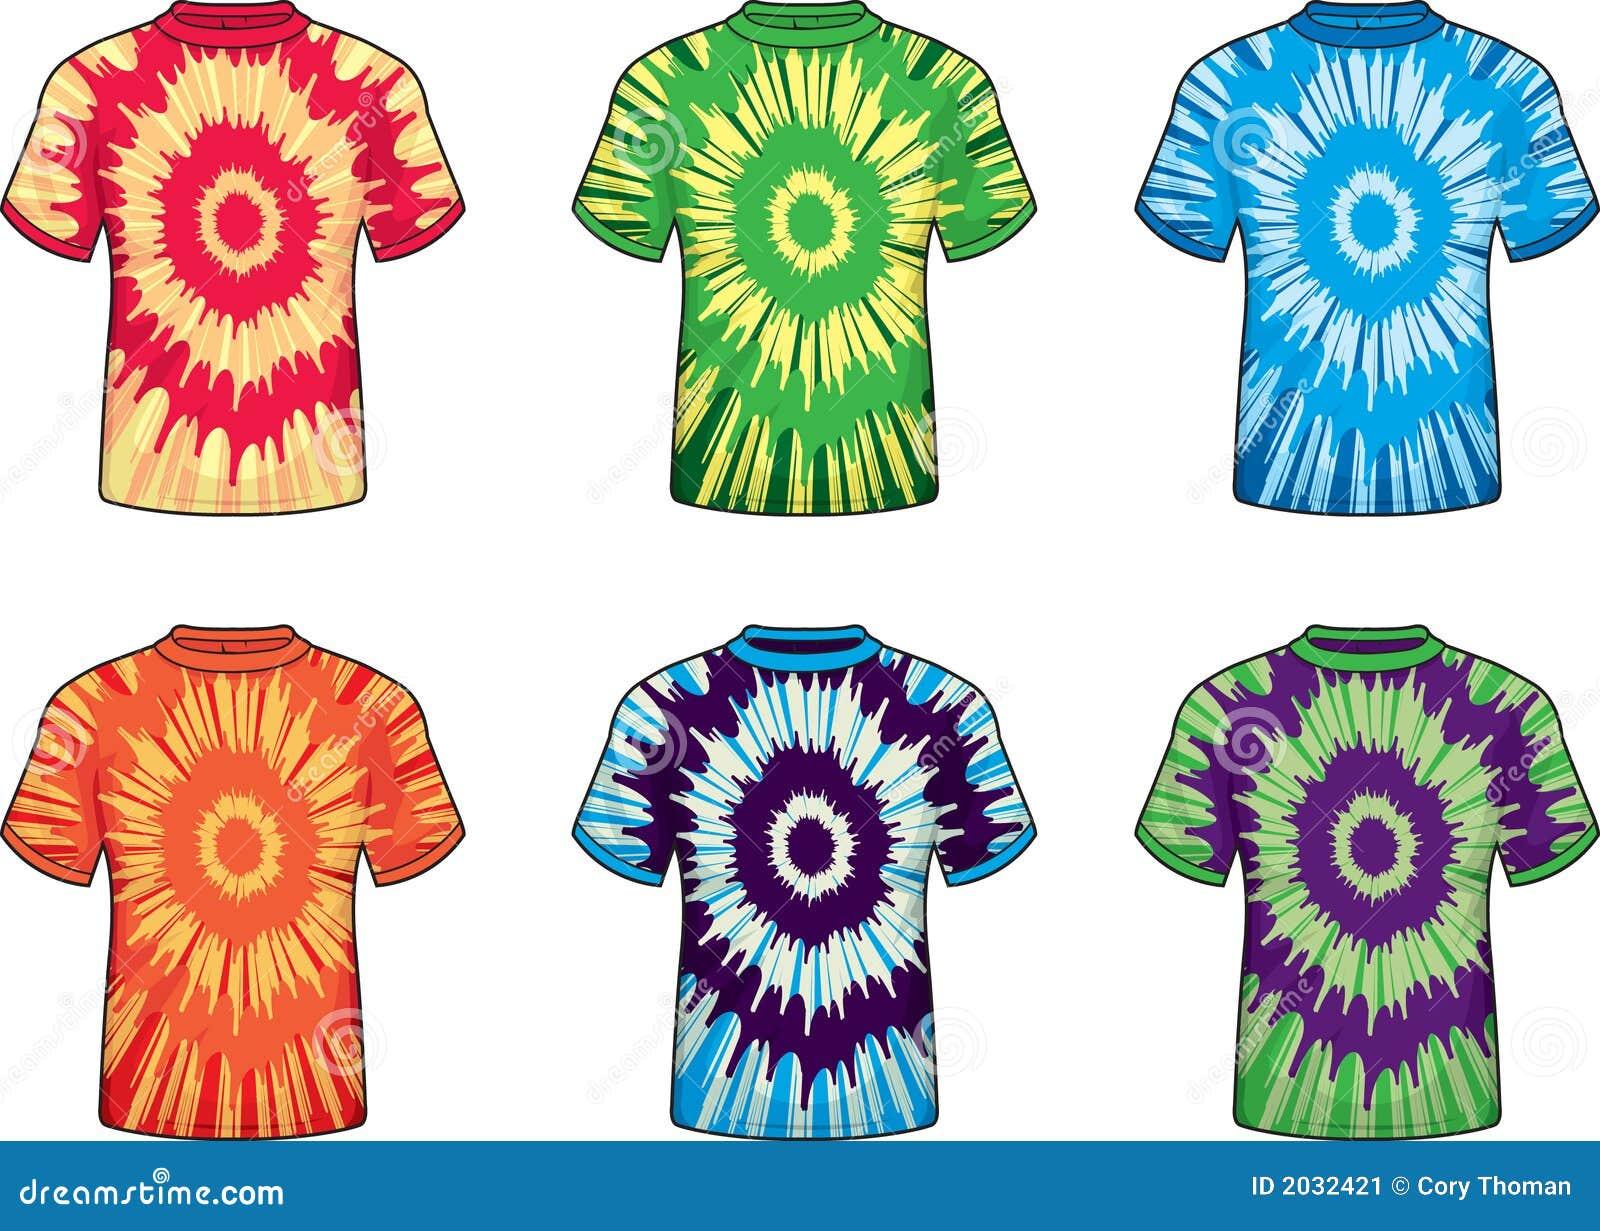 9d021007 Tie Dye Shirts stock vector. Illustration of vector, shirt - 2032421